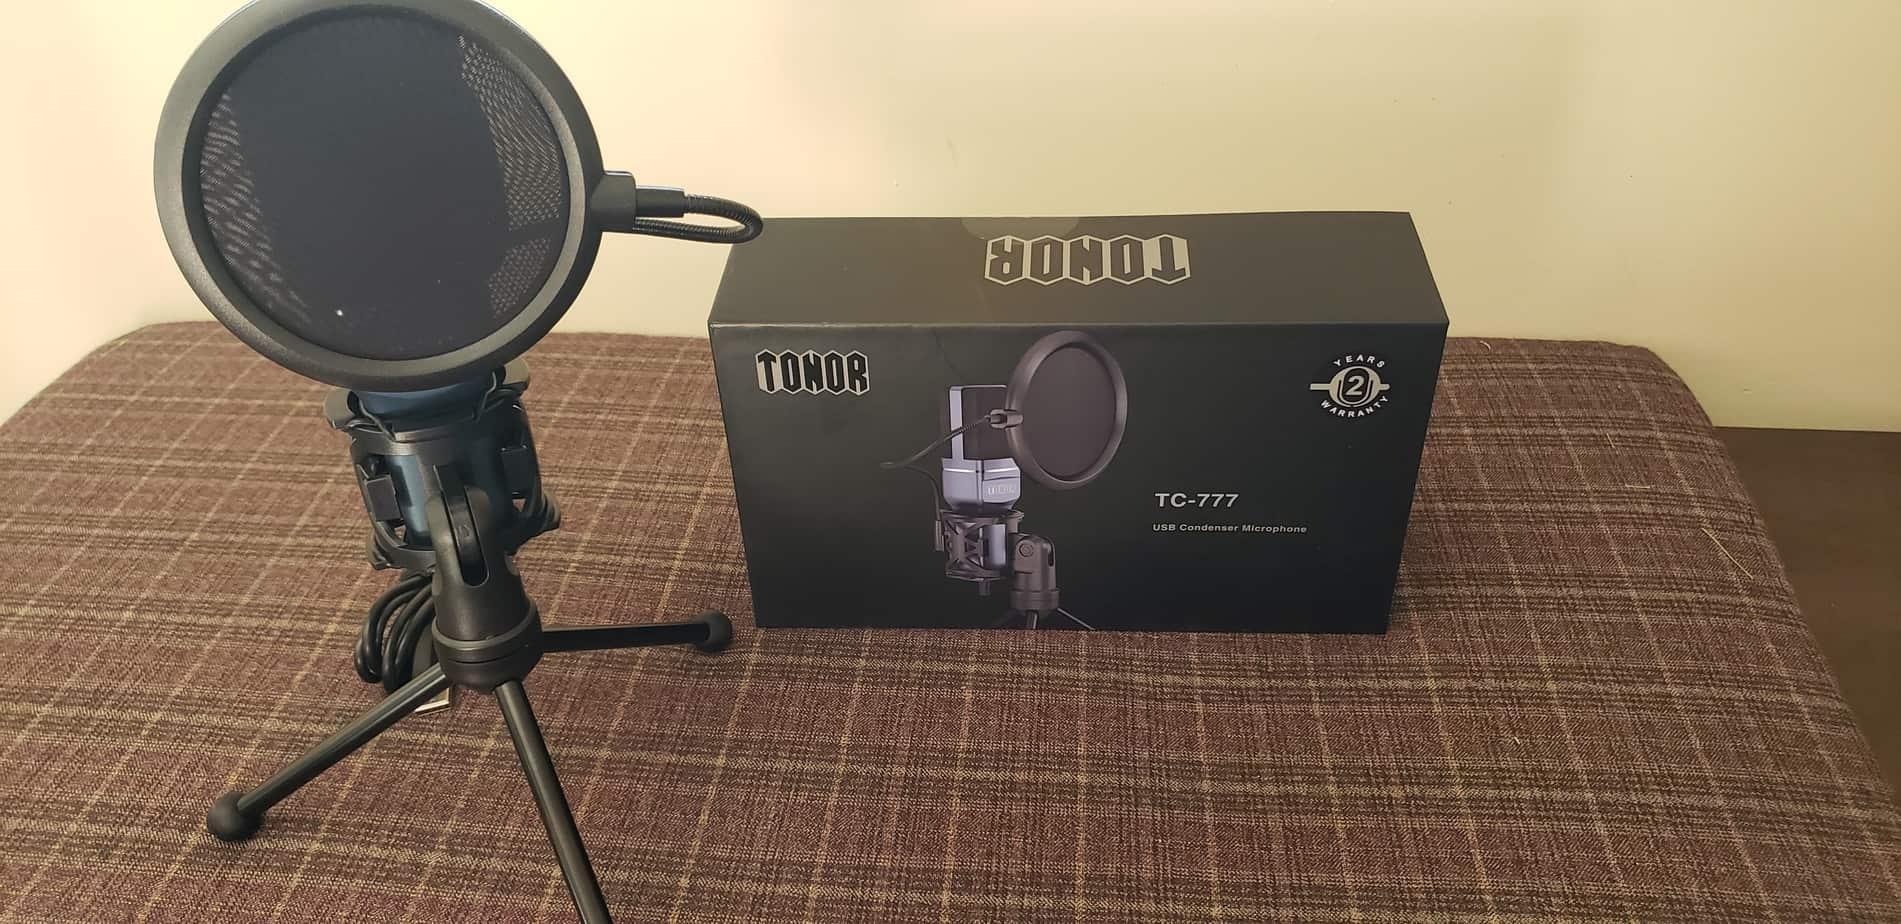 Tonor Microphone - TC-777 Setup